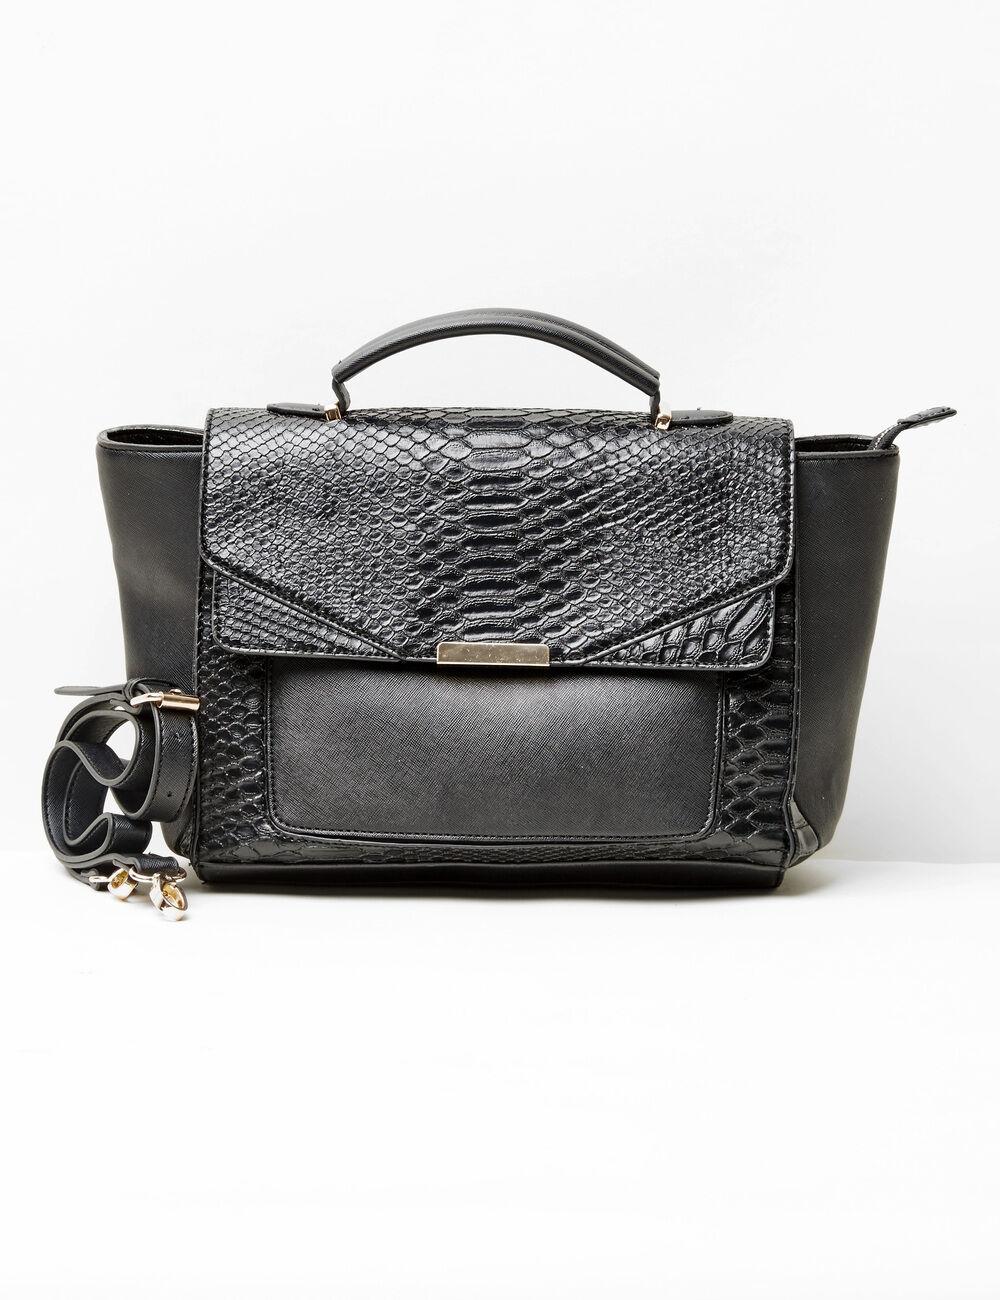 Sac A Main Cartable Cuir Noir : Sac cartable motif python noir femme jennyfer